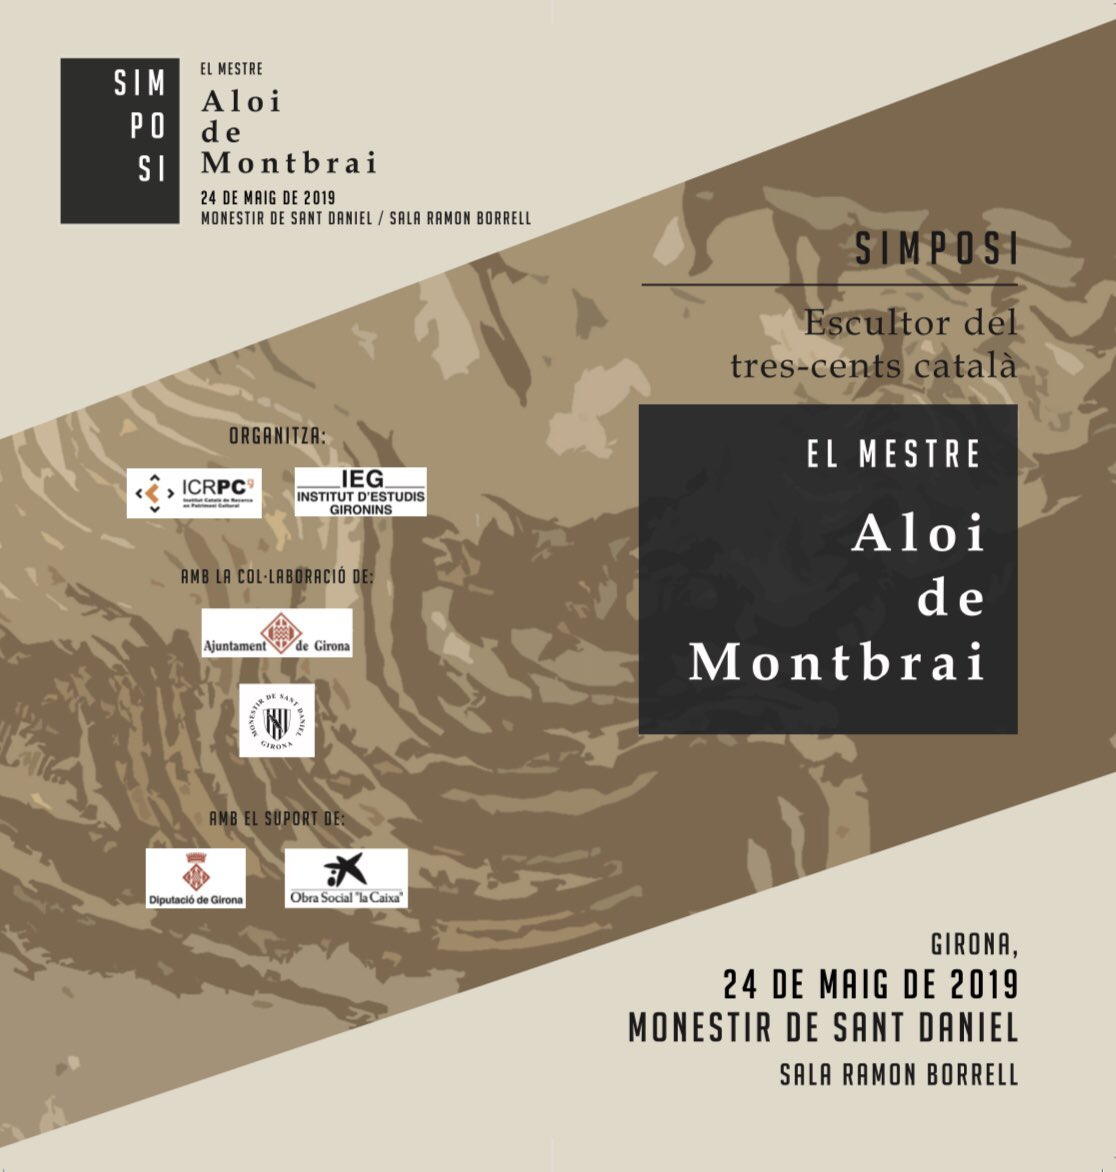 Simposi El mestre Aloi de Montbrai. Escultor del tres-cents català